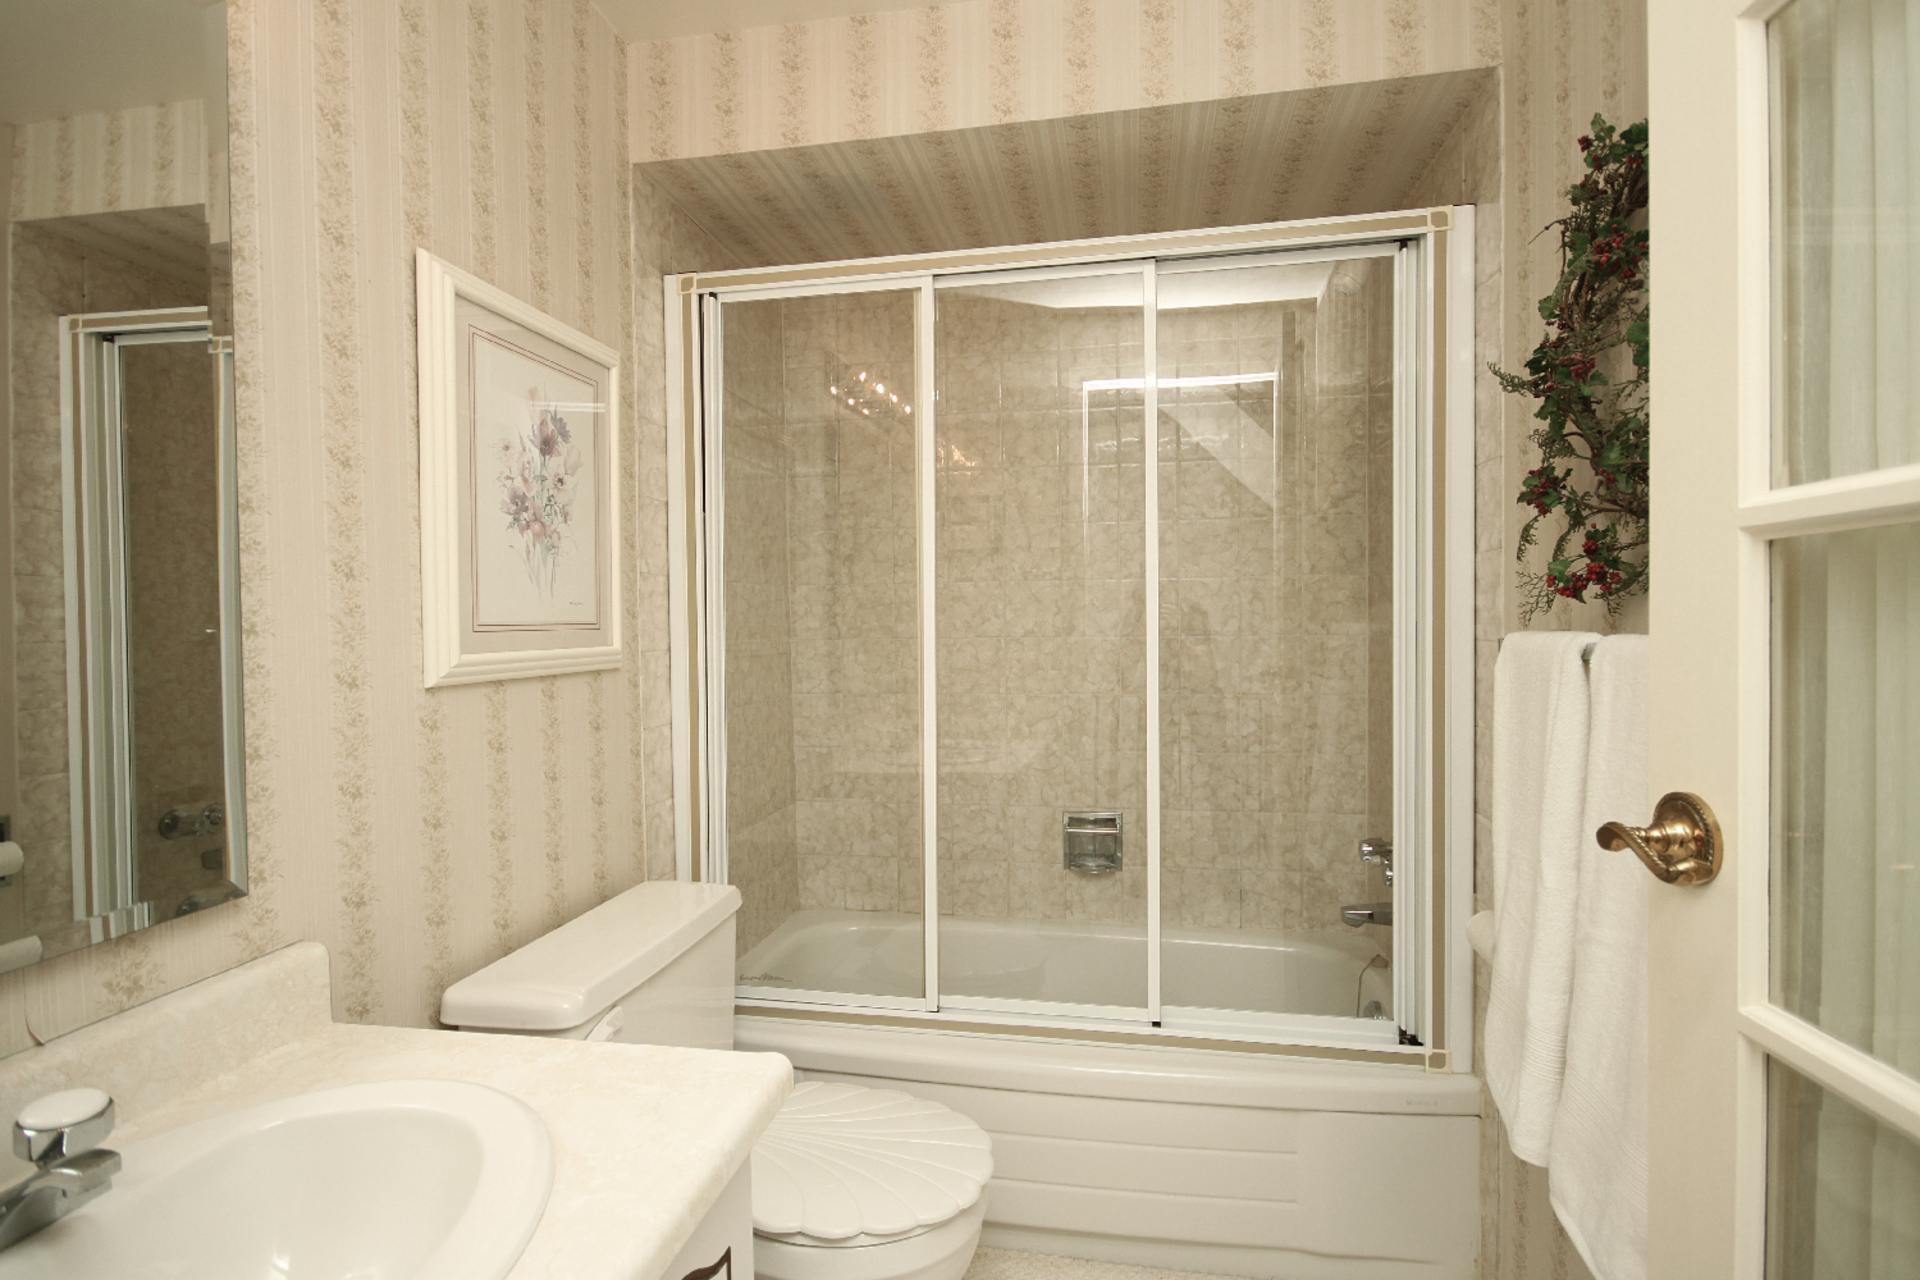 4 Piece Bathroom at 93 Dutch Myrtle Way, Banbury-Don Mills, Toronto